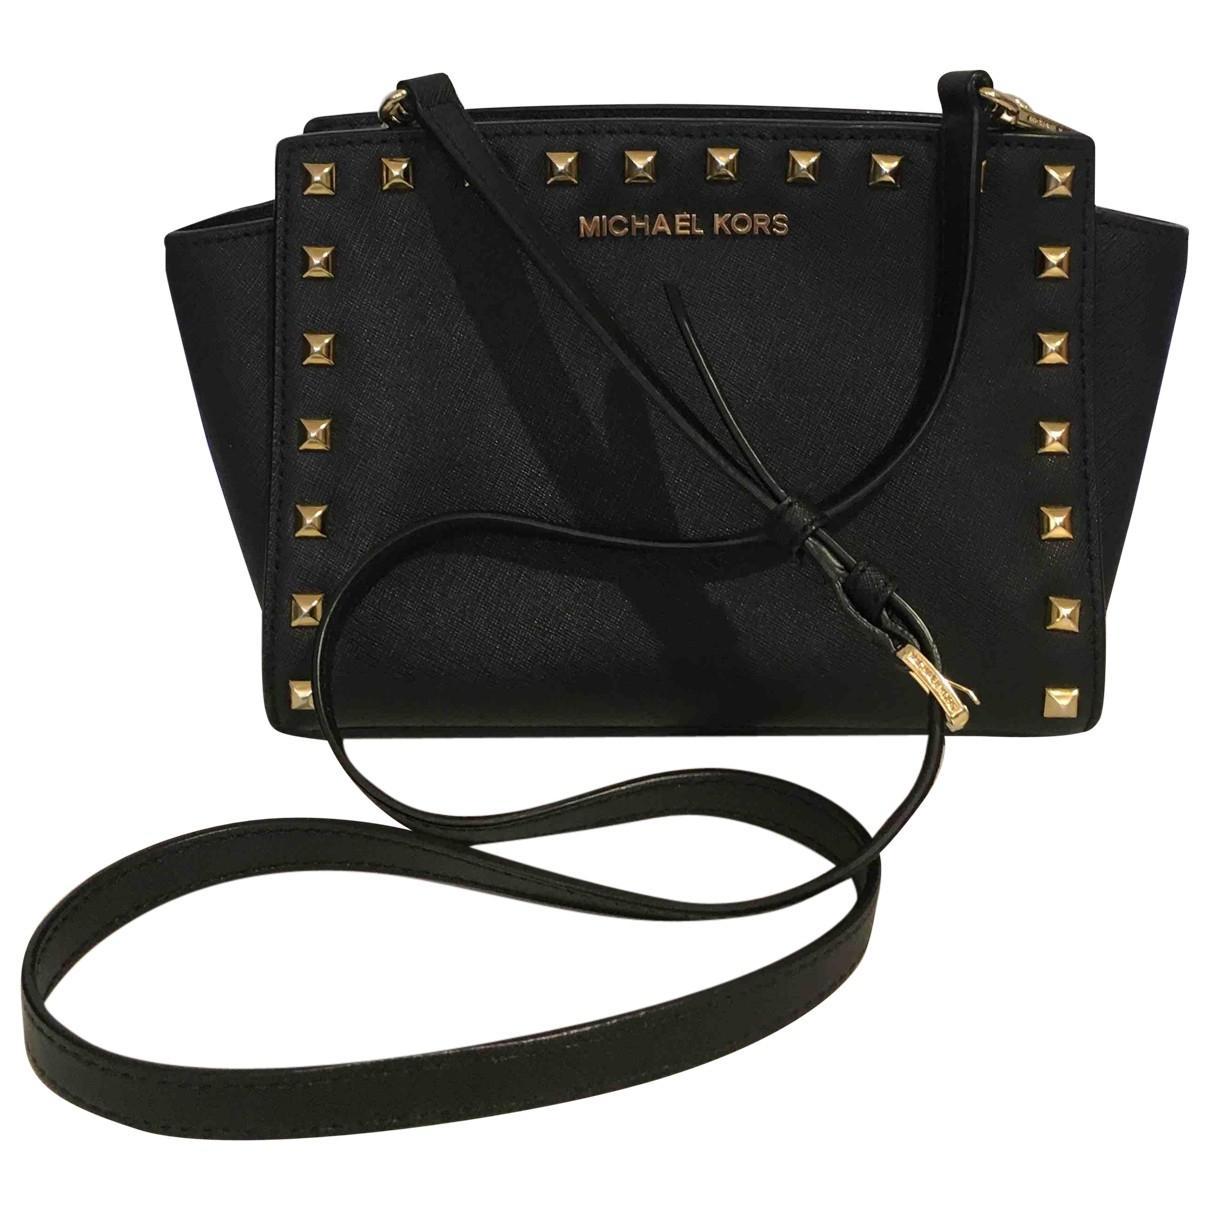 Michael Kors Black Pre Owned Leather Crossbody Bag Lyst View Fullscreen